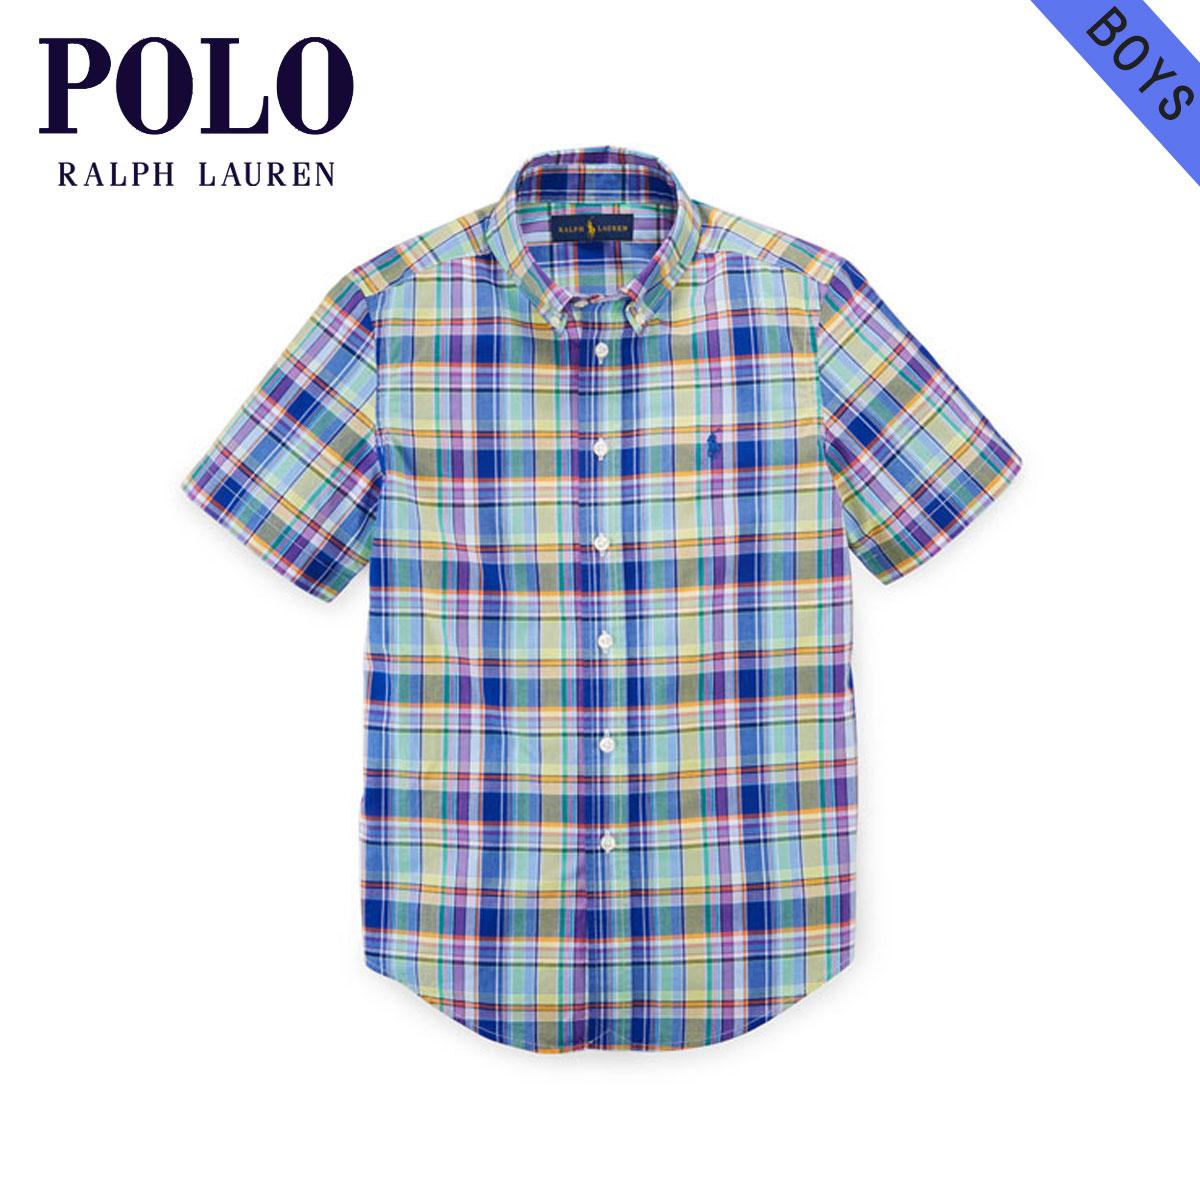 Shirt 85653736 Children's Ralph Article Polo Plaid Boys Sleeves Children Regular Short Cotton Clothes Poplin Lauren Kids u1JKc3Tl5F